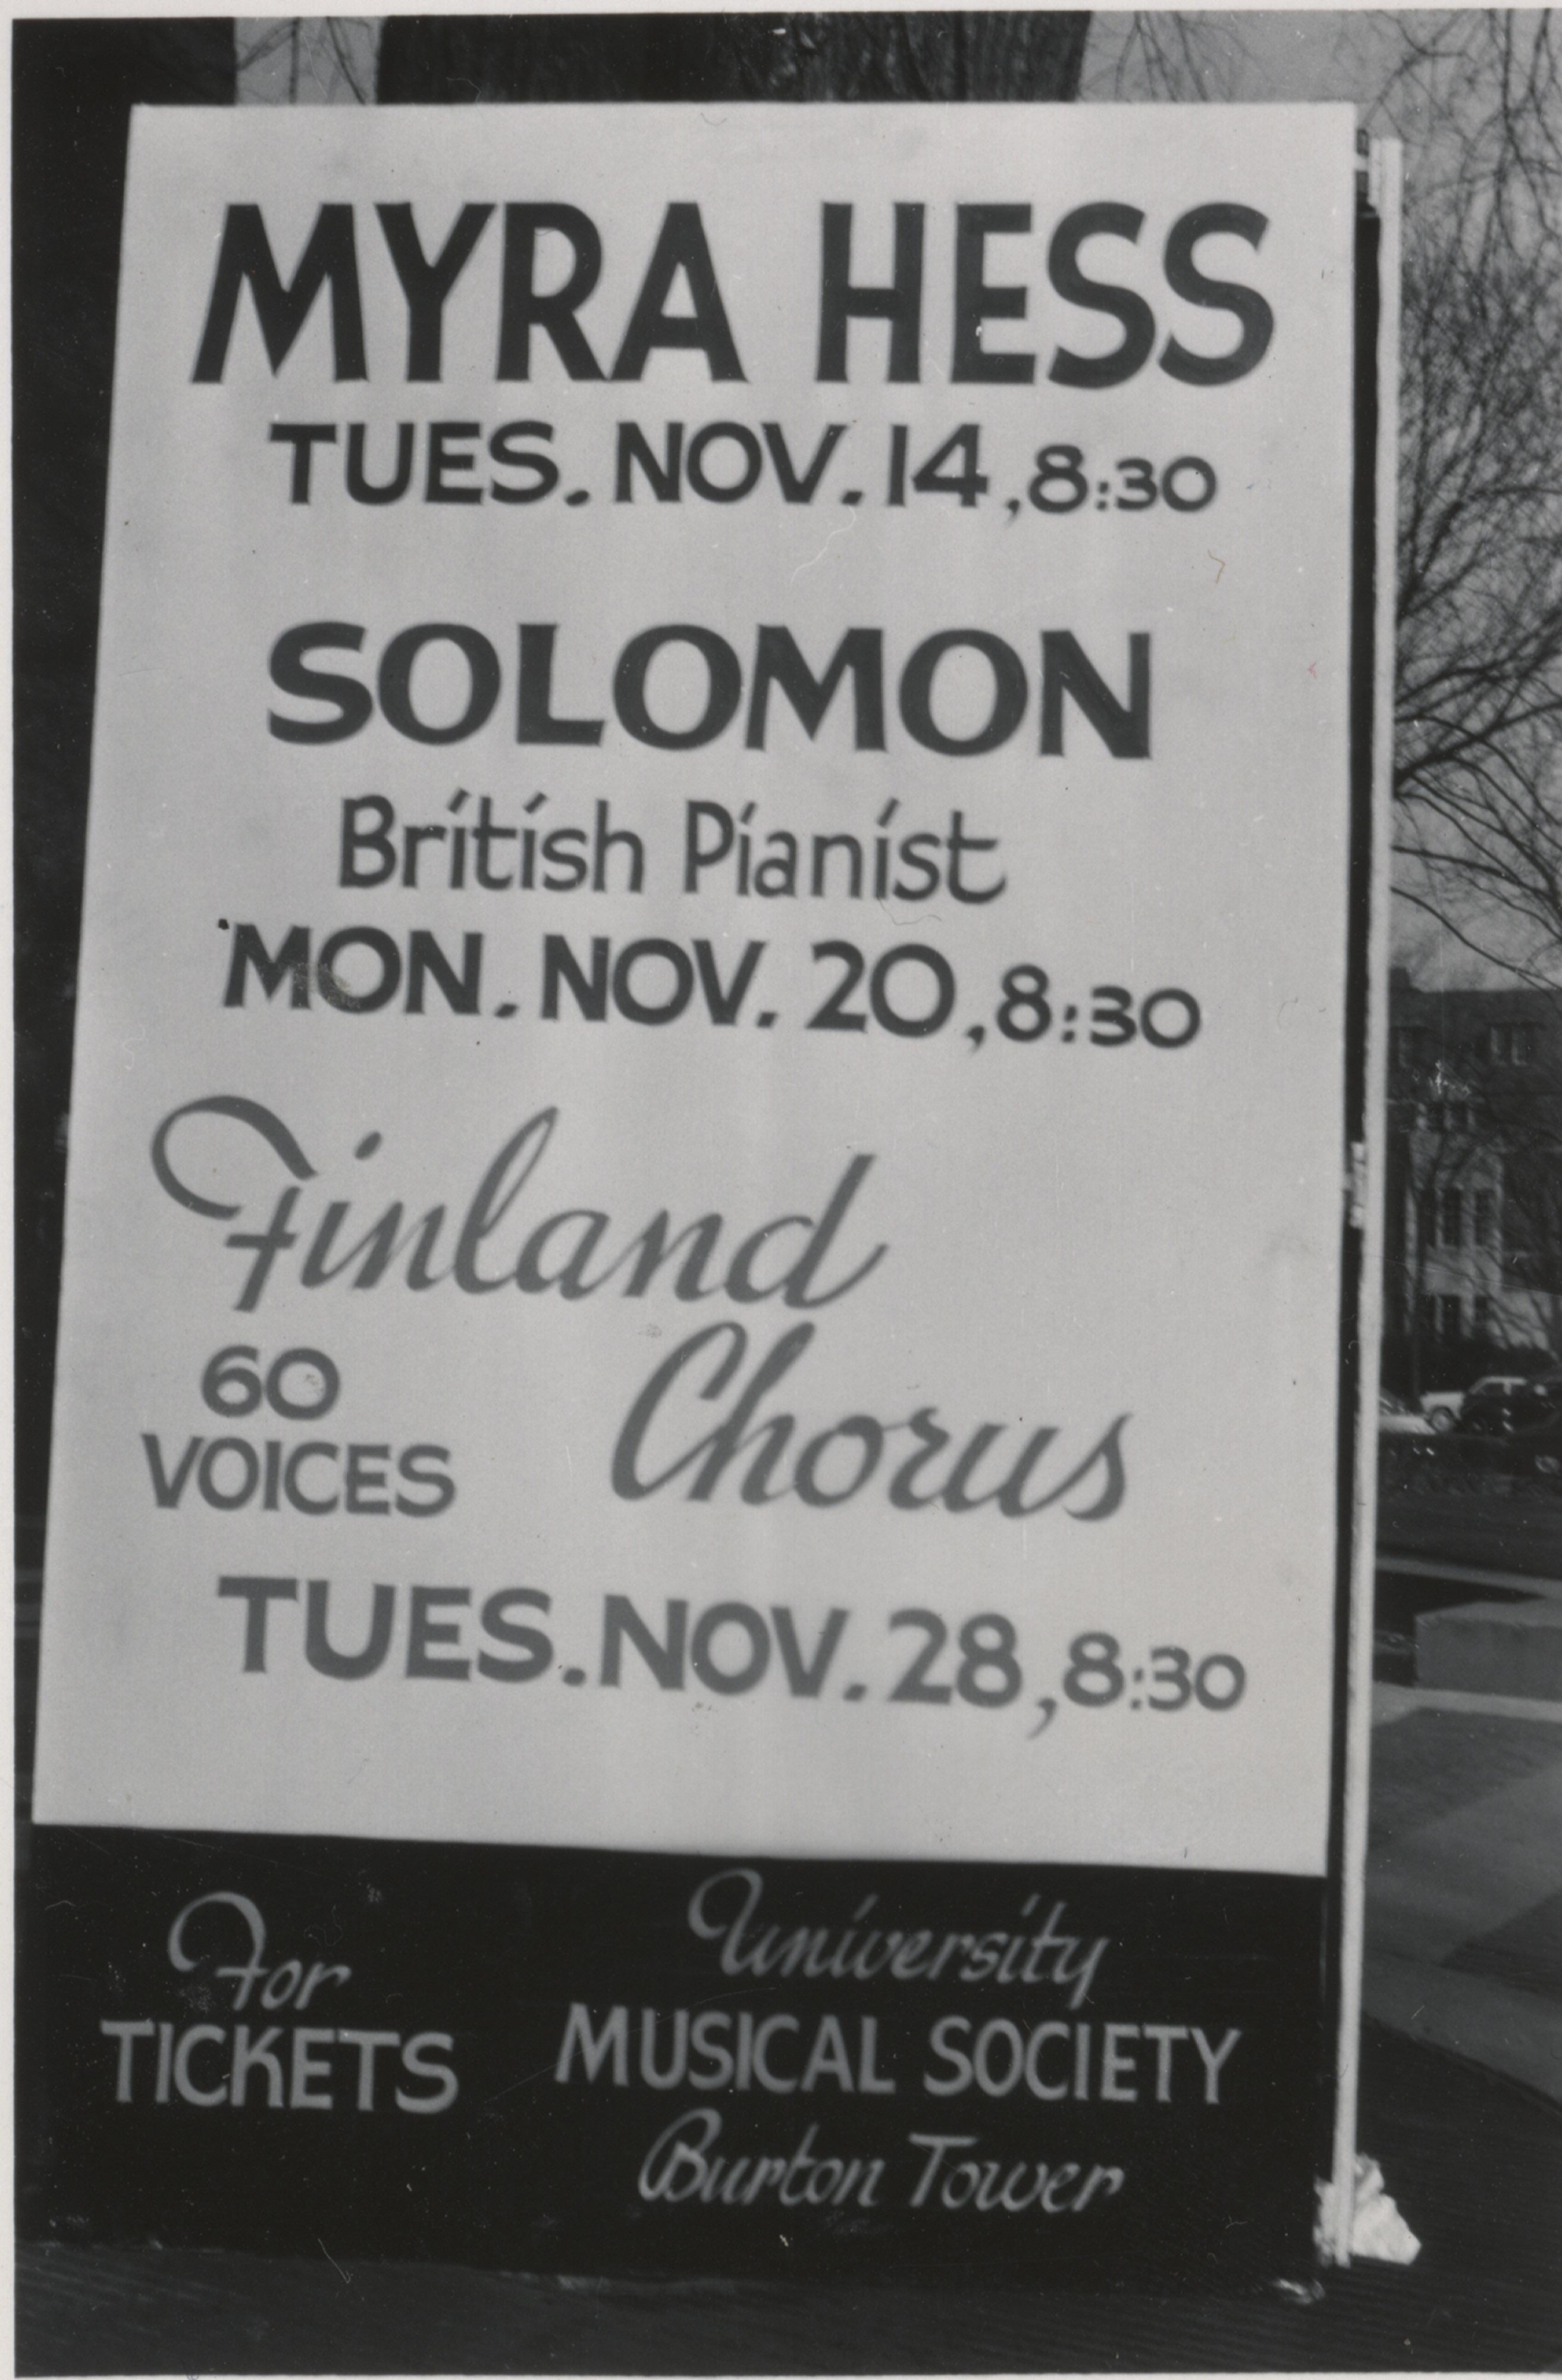 Myra Hess Concert Advertisement